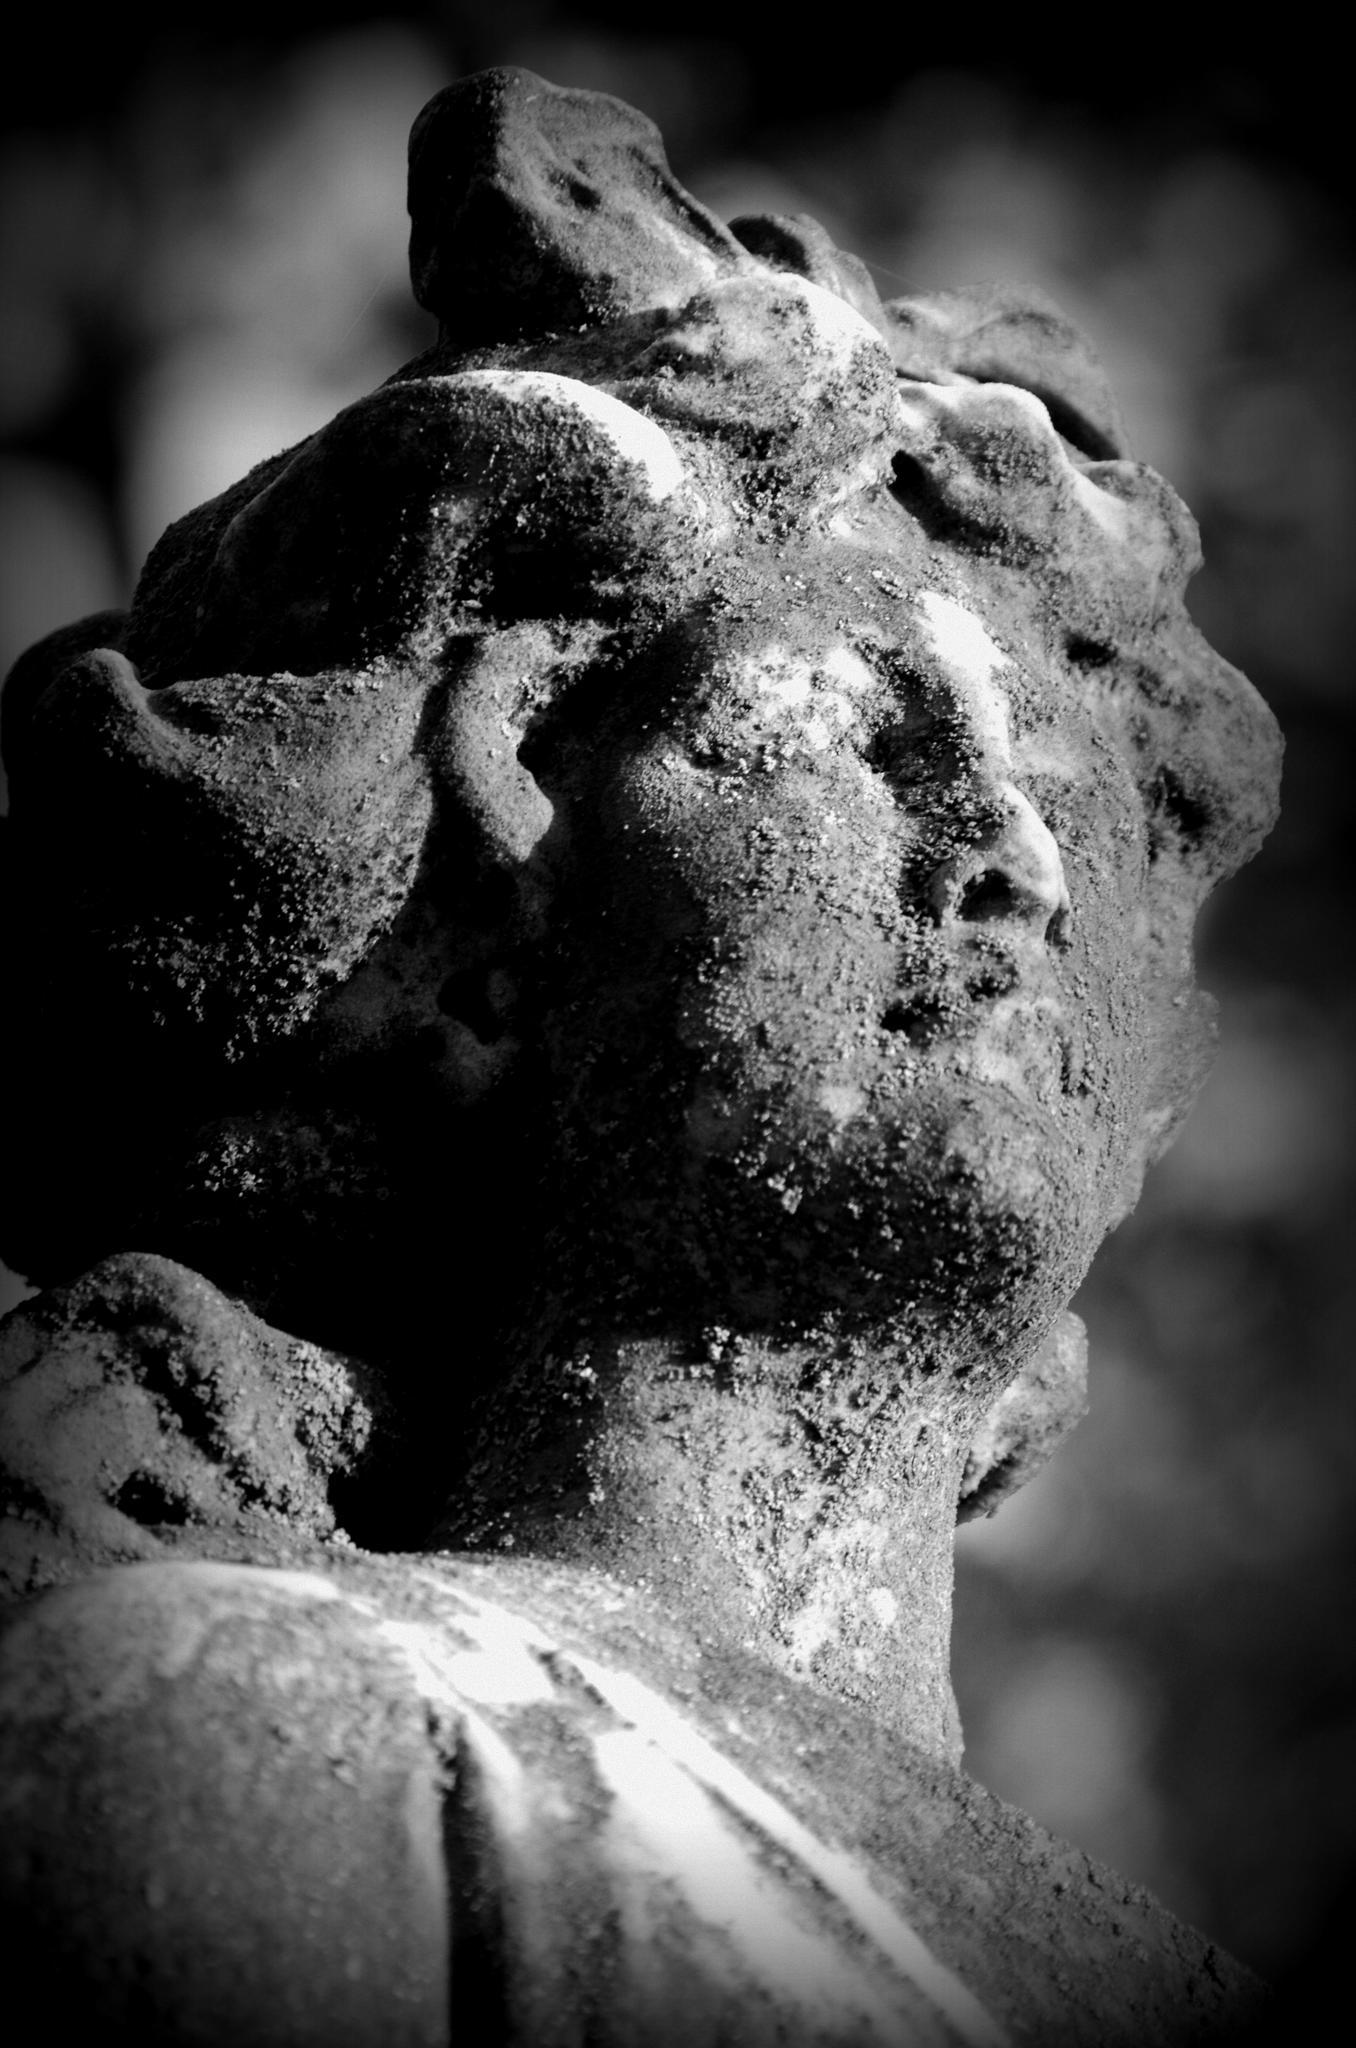 Lone watcher by Elizabeth